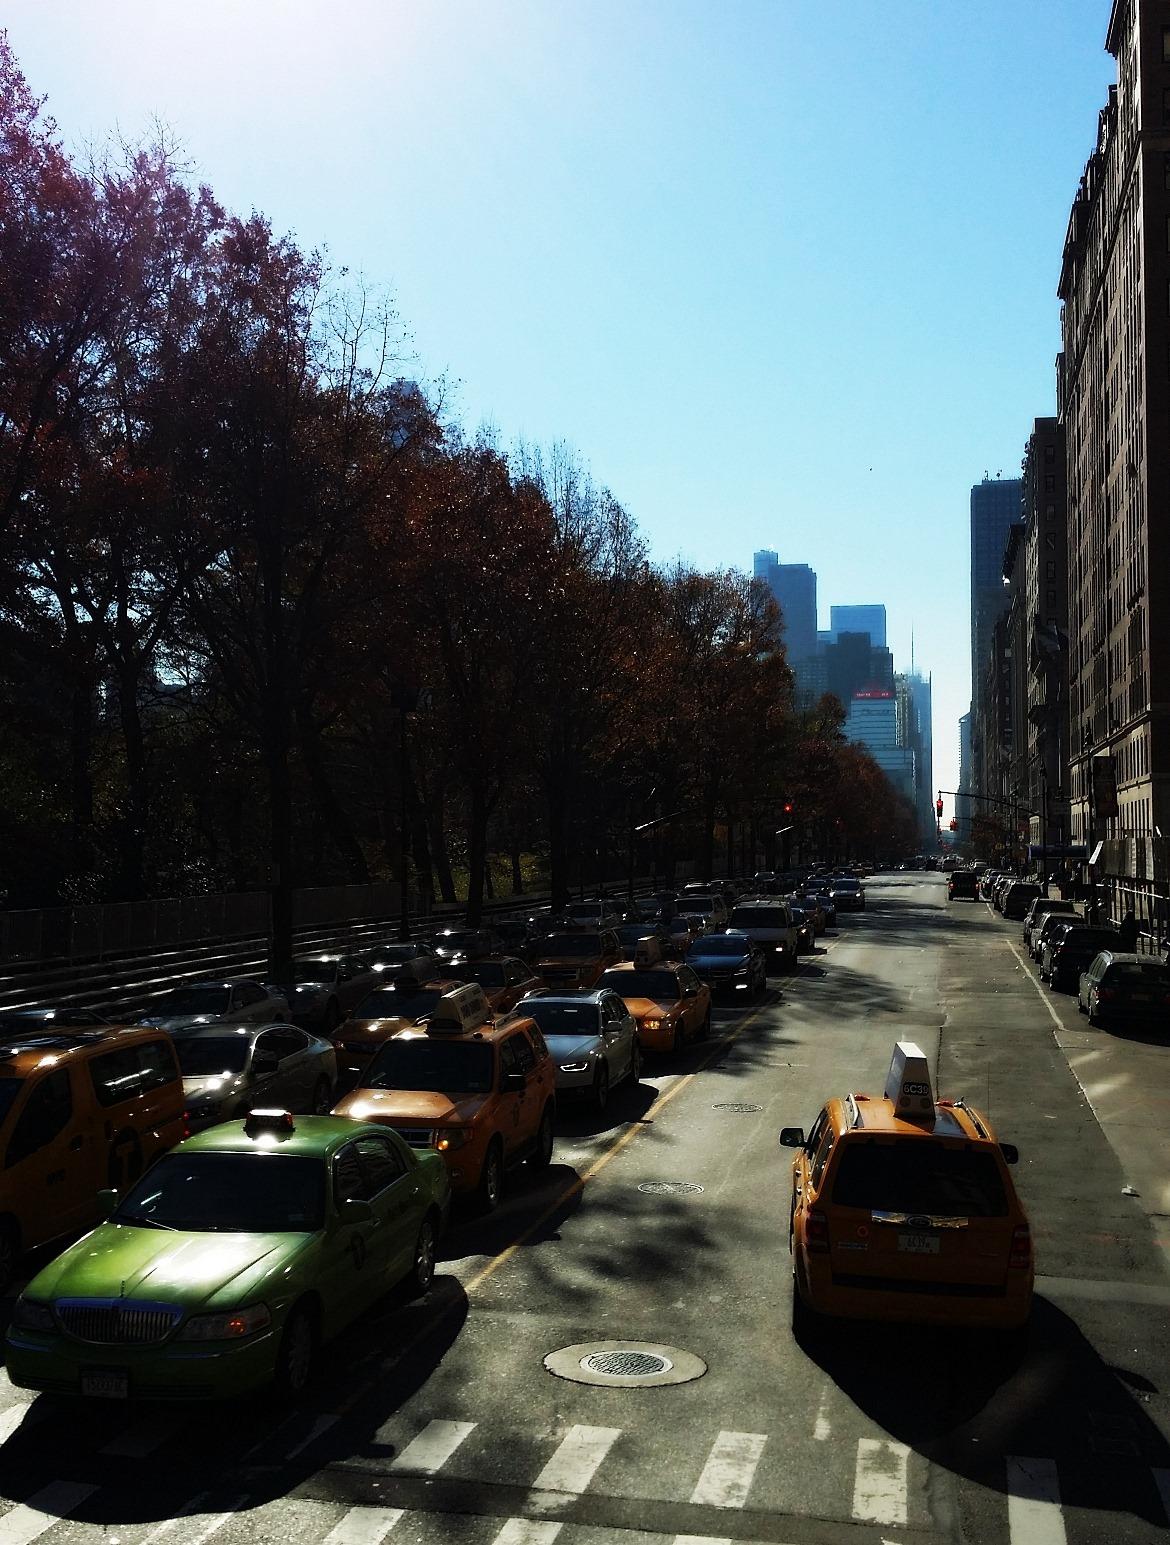 Upper West Side - New York New York, travel blog by BeckyBecky Blogs